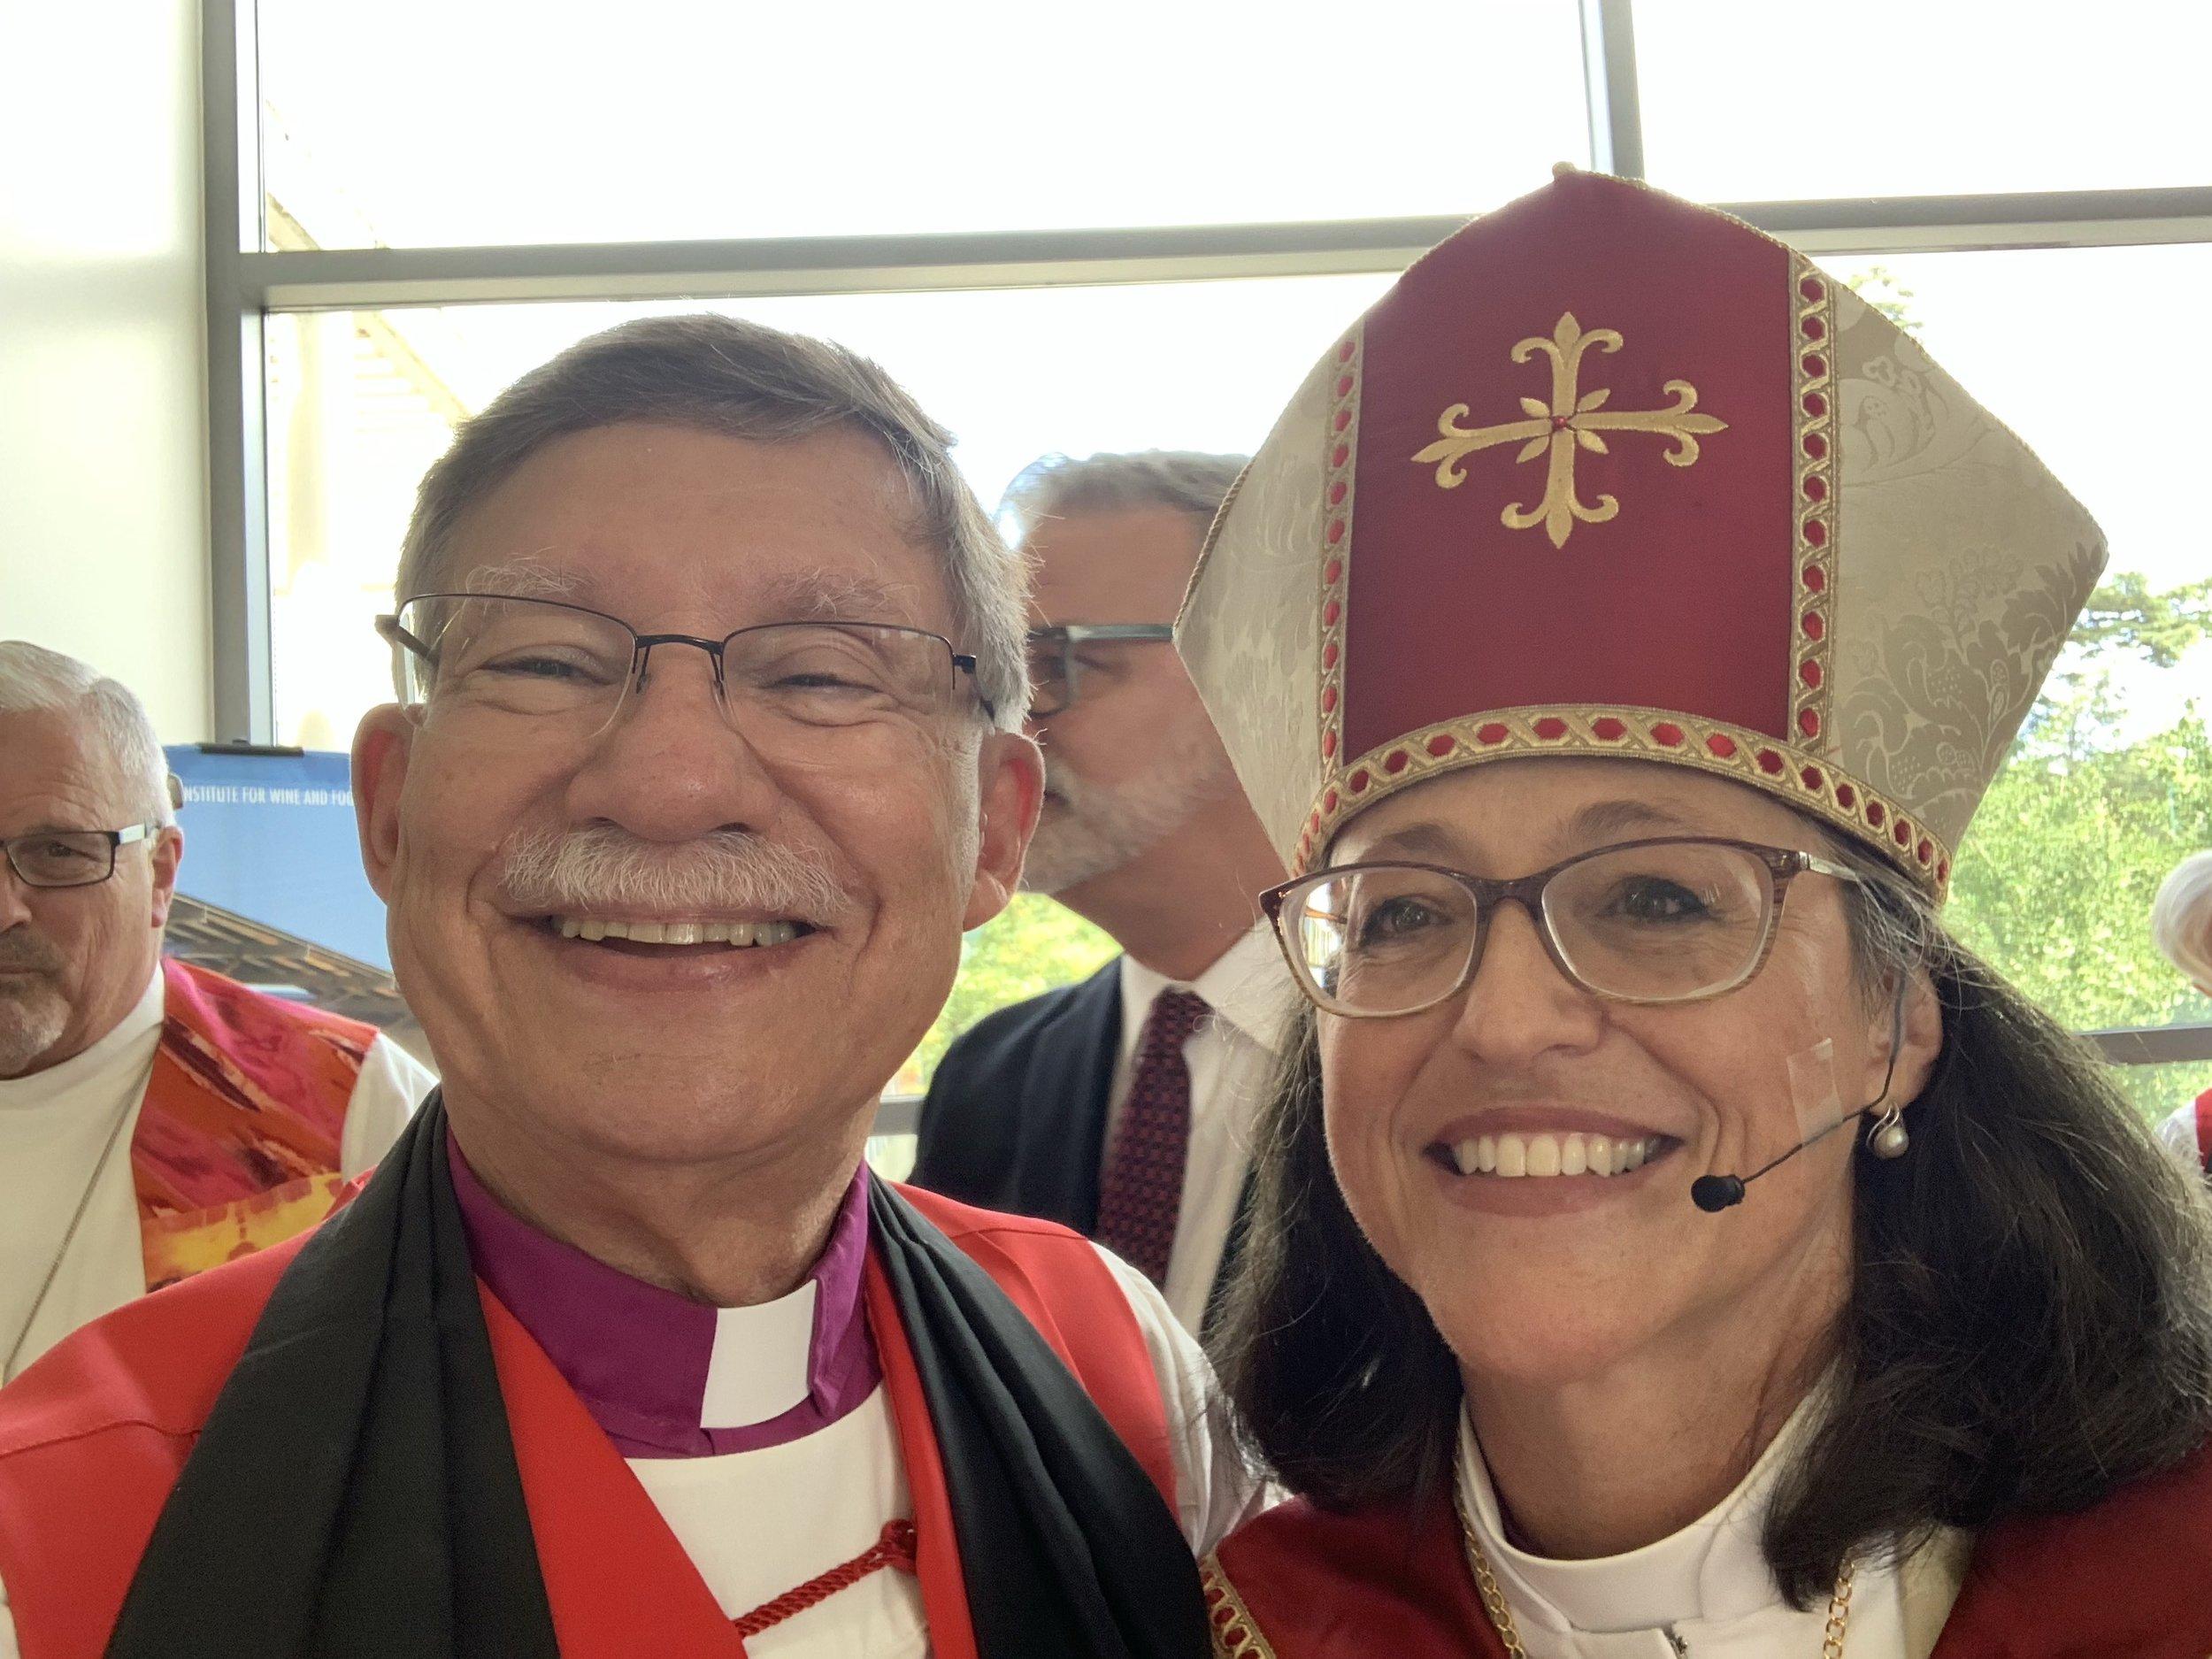 Bishop Ed Little and Bishop Megan Traquair